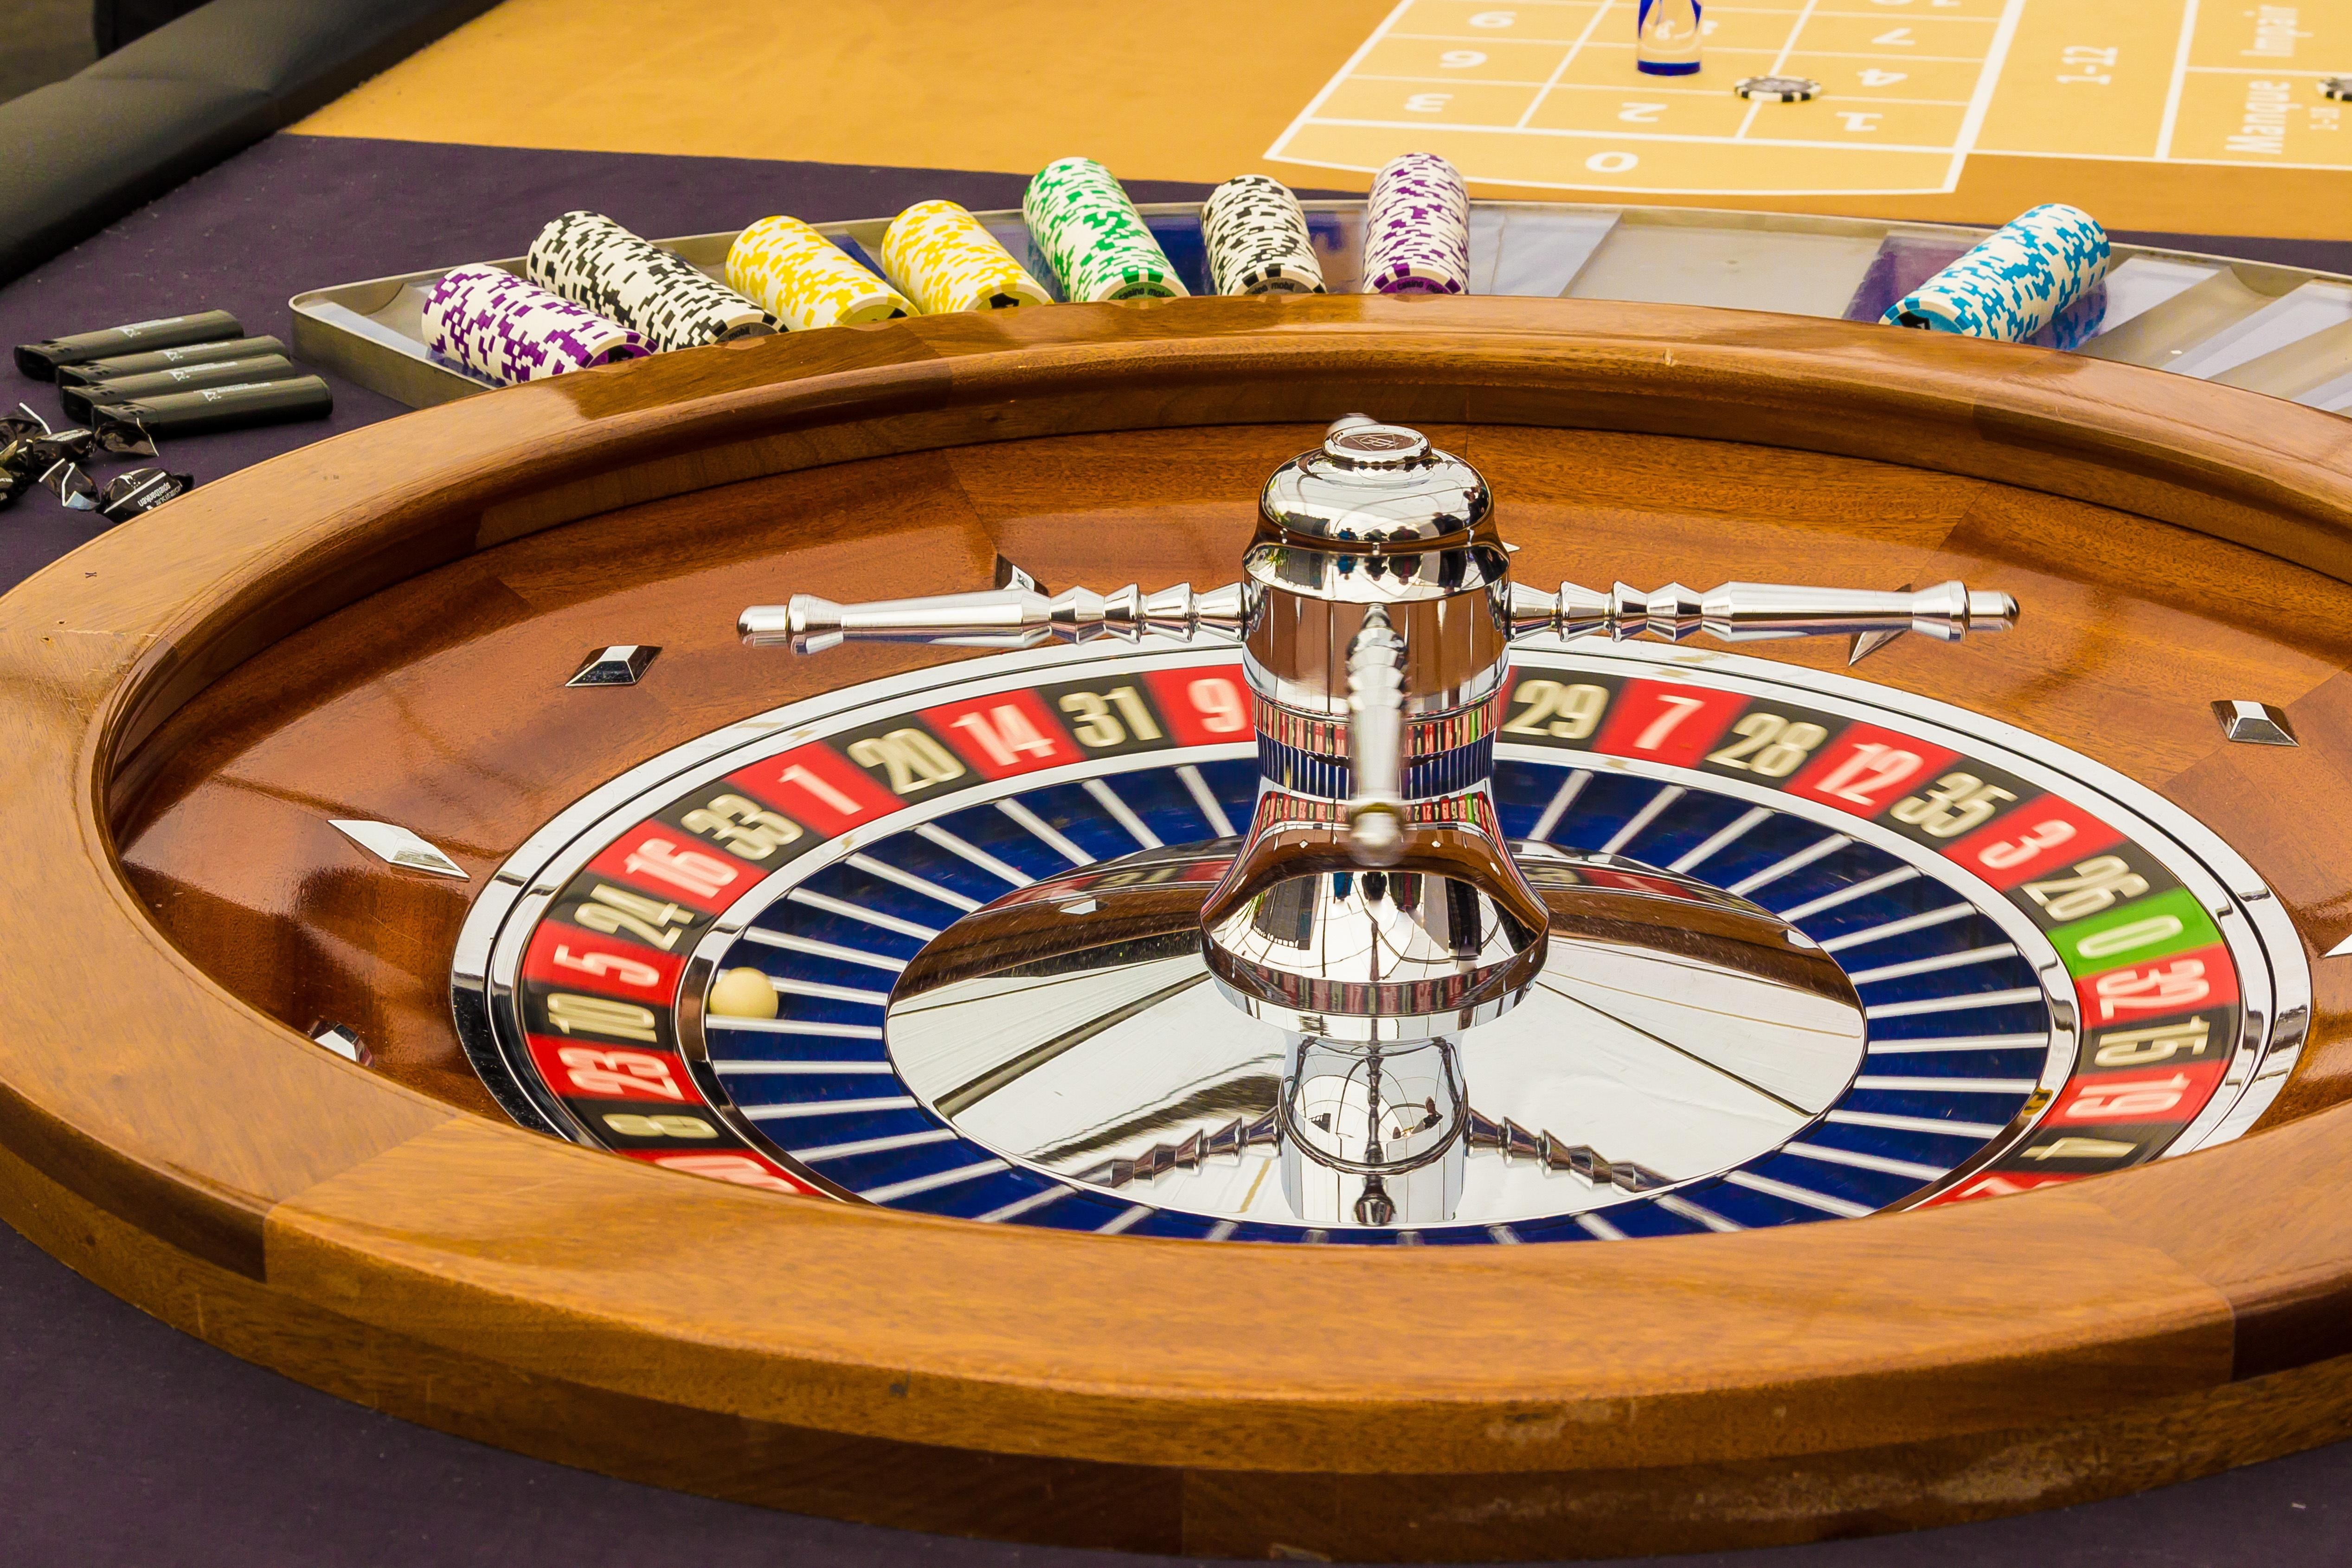 Vgt slot machines for sale